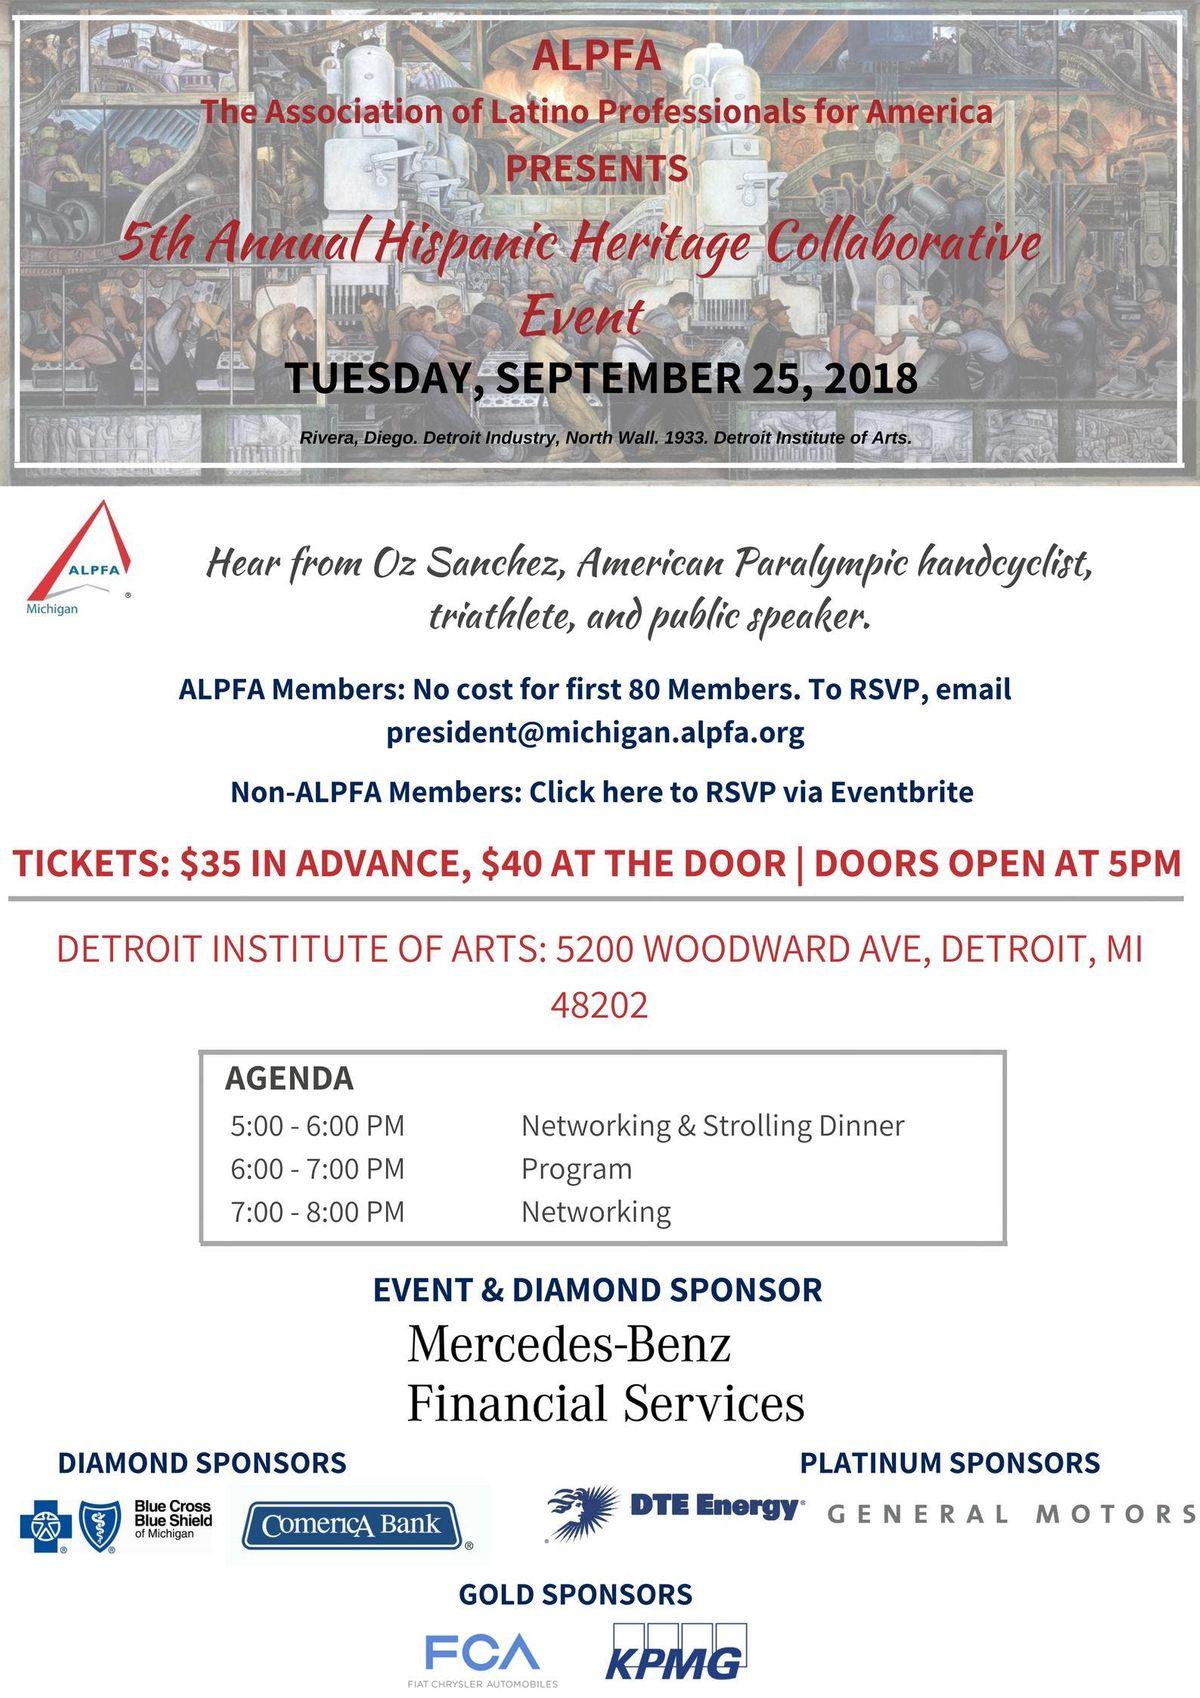 5th Annual Hispanic Heritage Collaborative Event